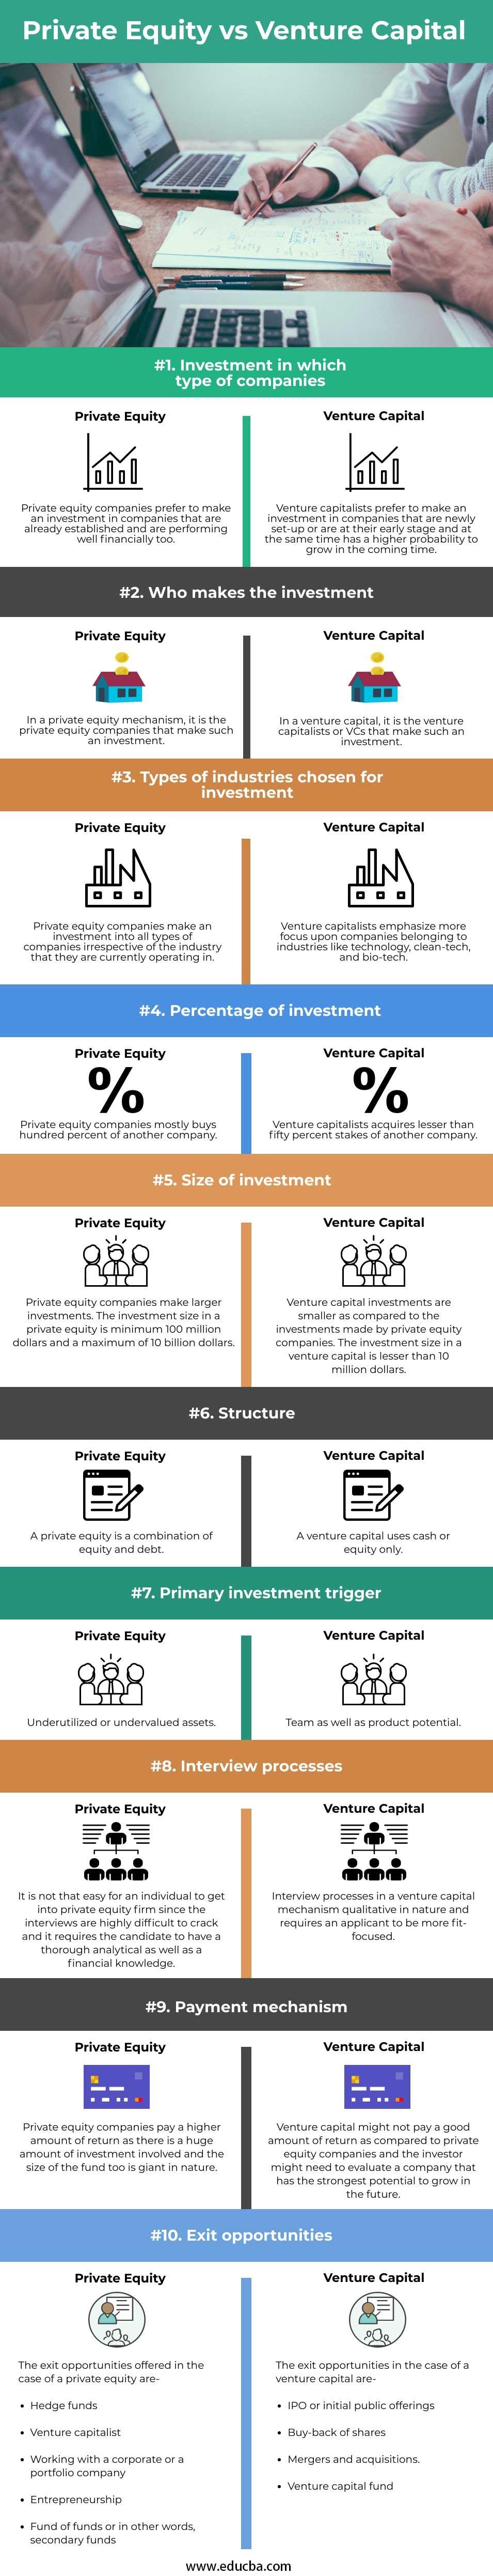 Private-Equity-vs-Venture-Capital-info